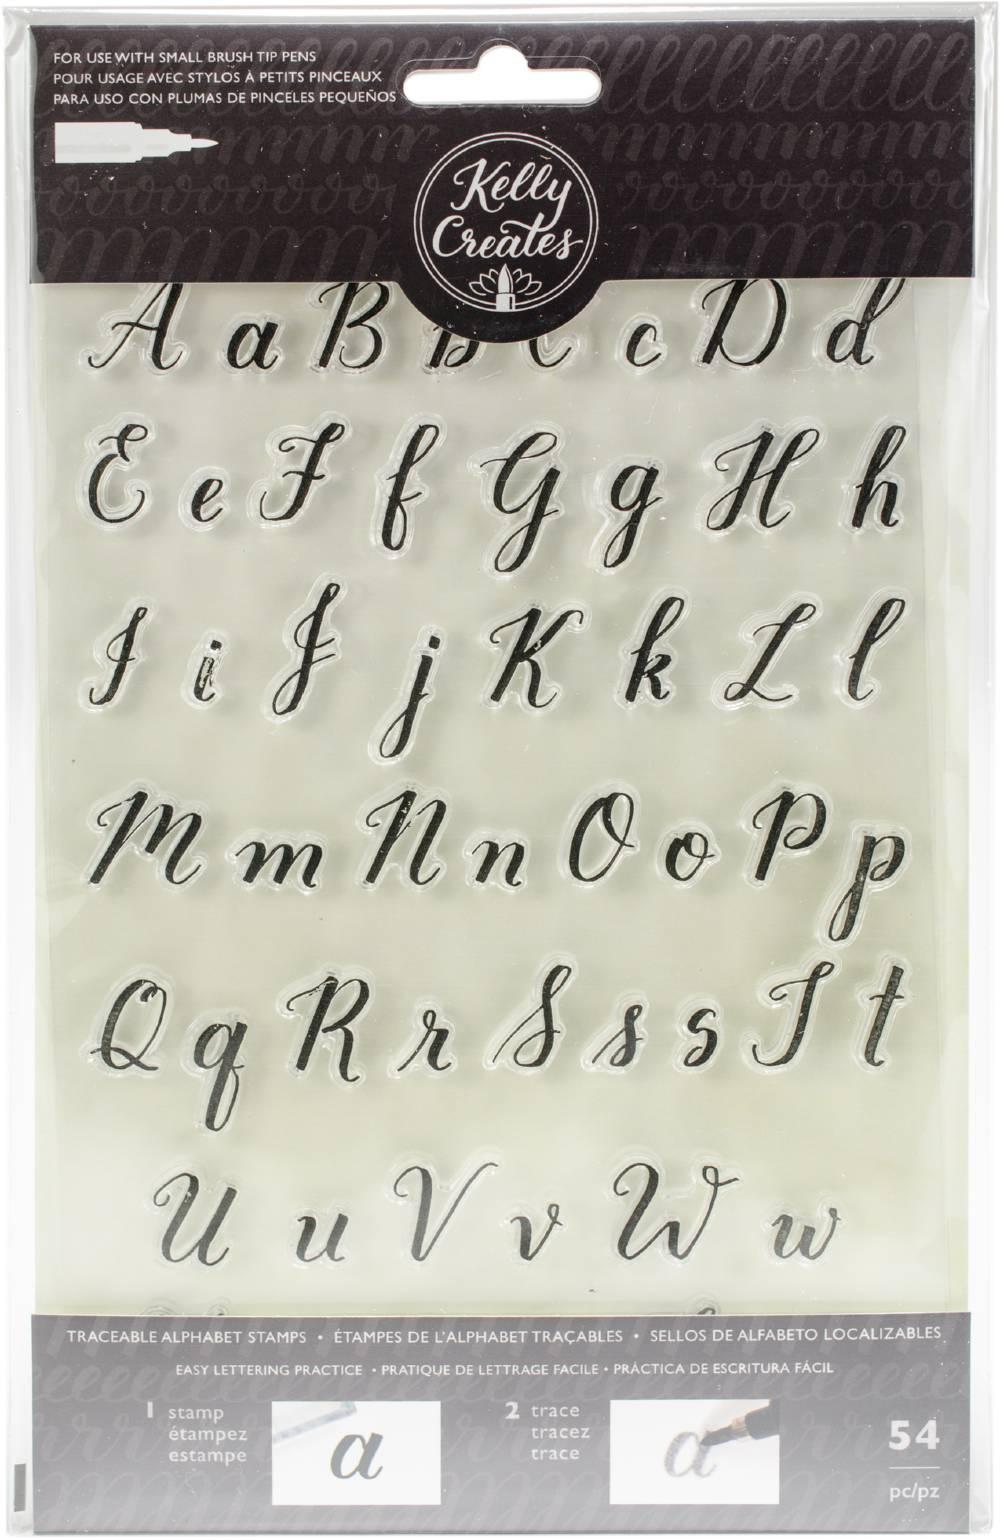 Kelly Creates Acrylic Traceable Stamps-Alphabet - Walmart